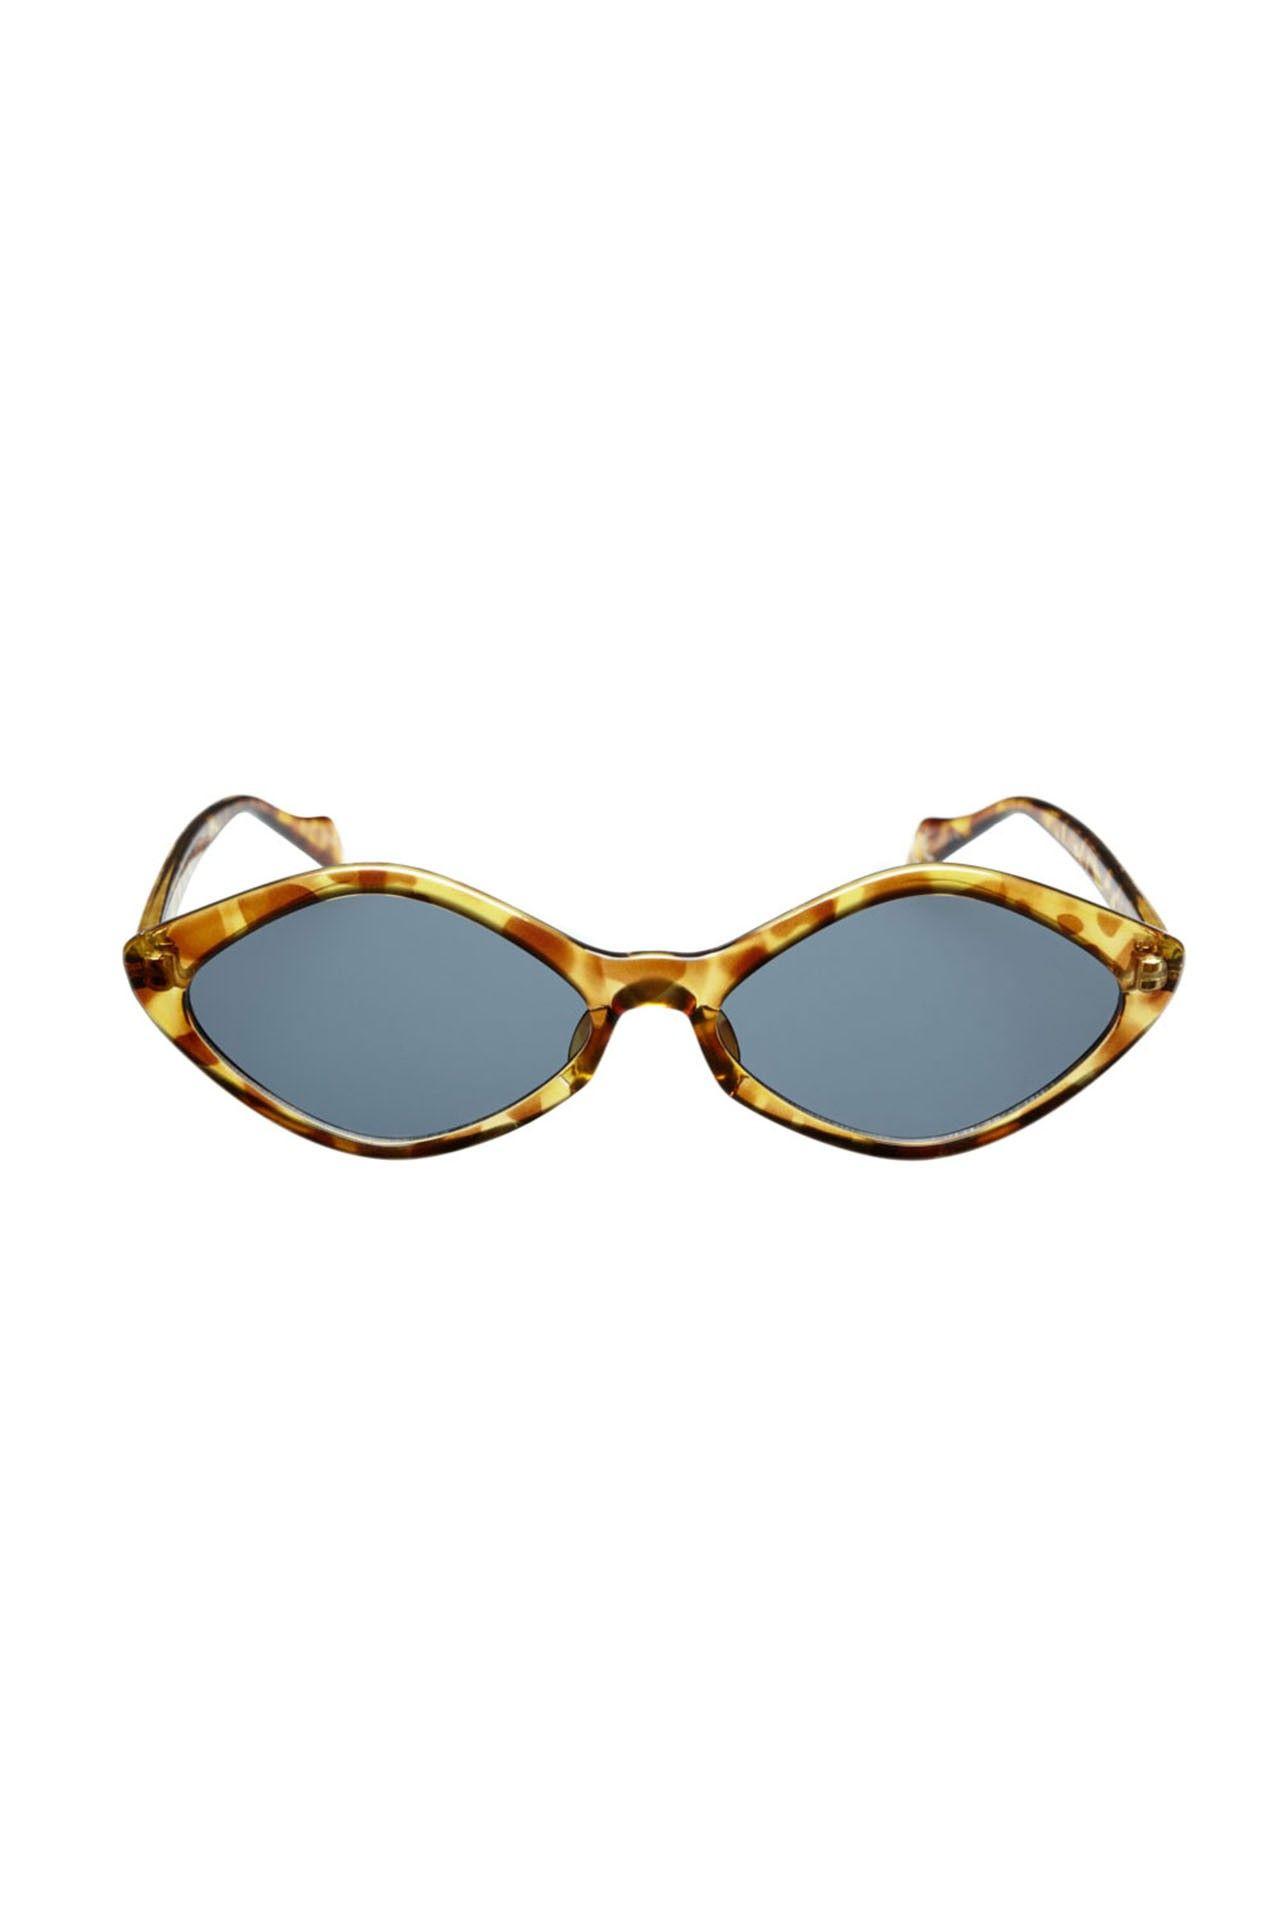 Afbeelding van Icon Eyewear Zonnebril 20014 Tort B